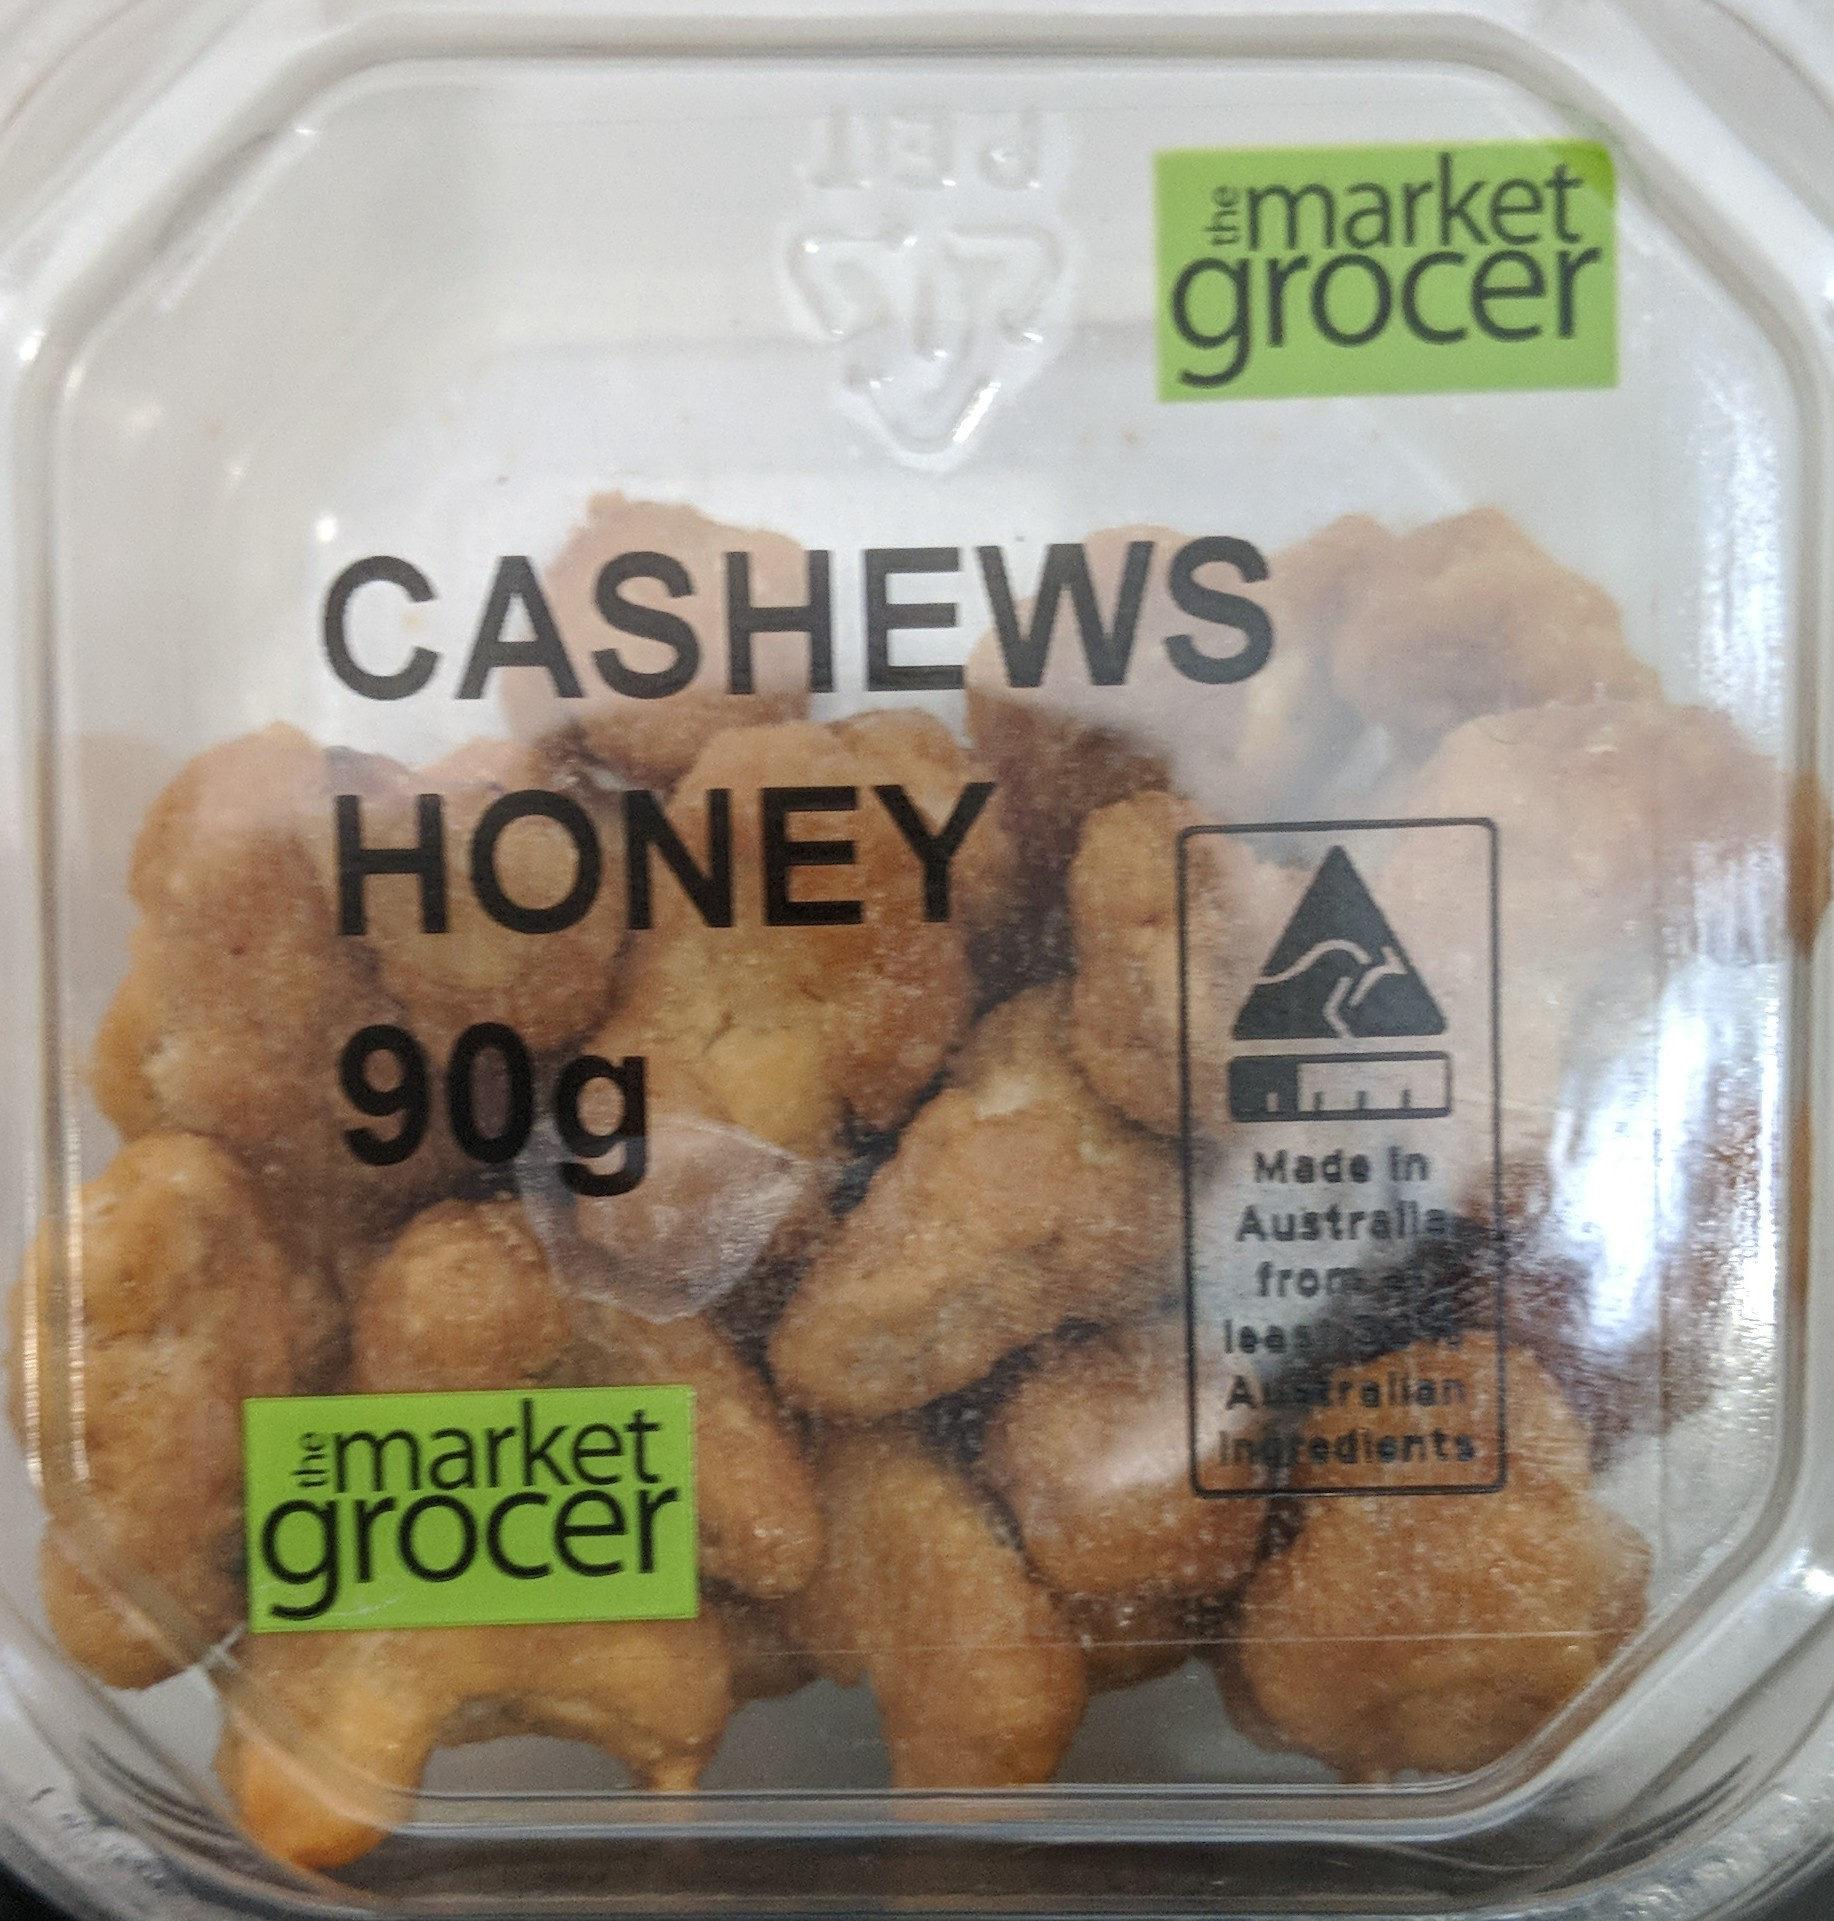 Cashews honey - Product - en